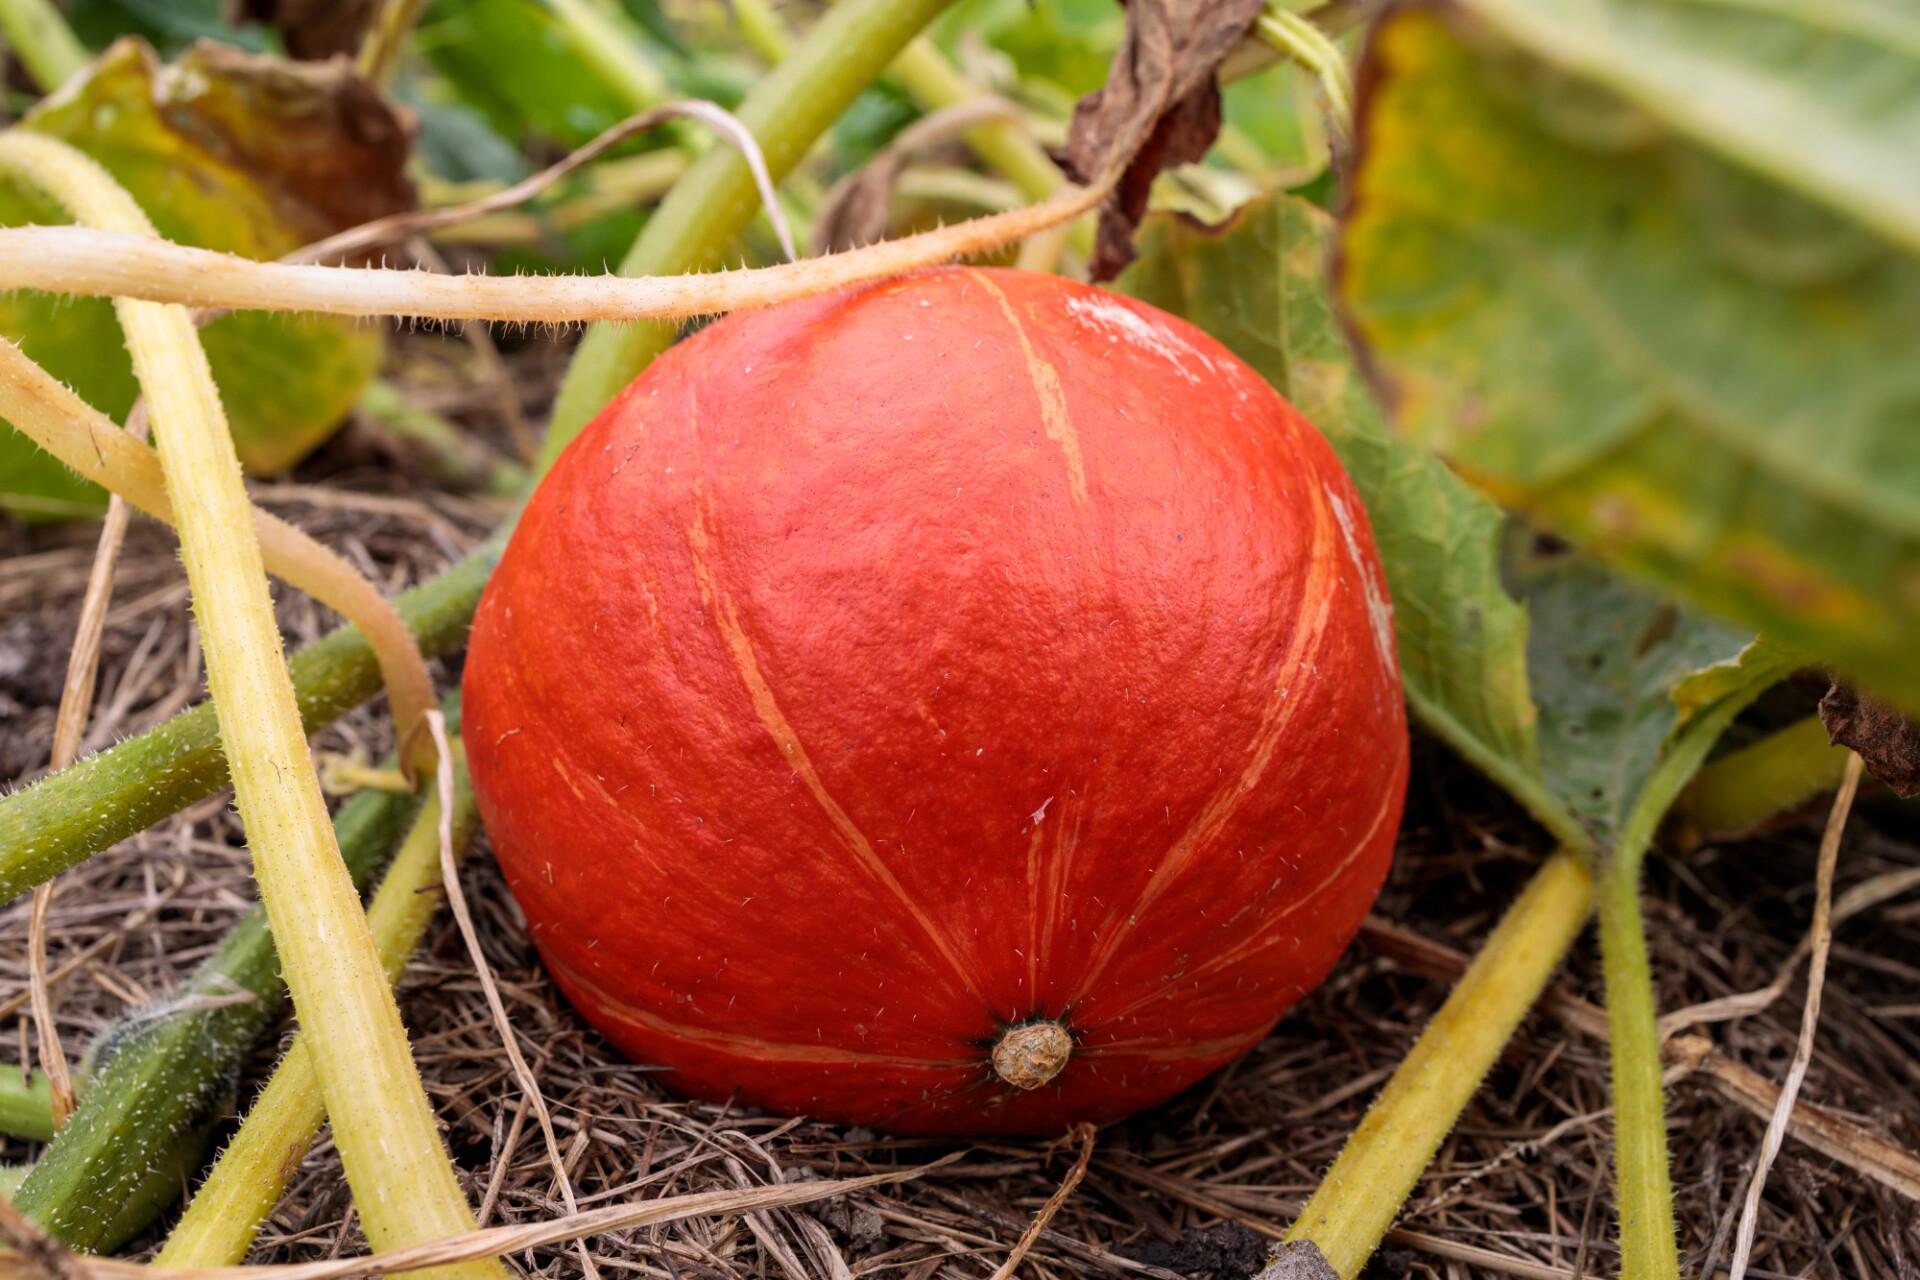 Orange pumpkin grows in the garden